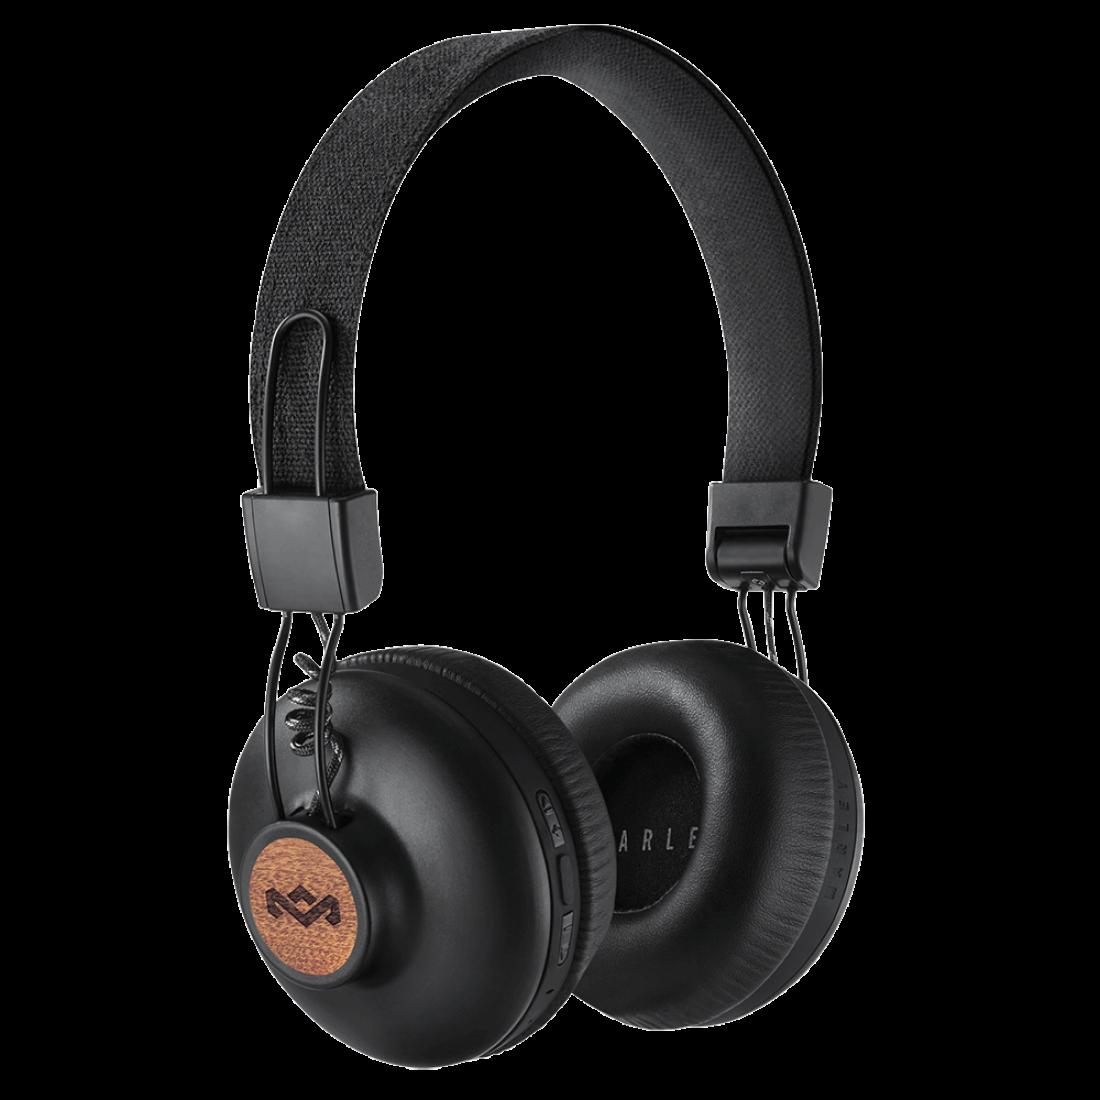 House of Marley Positive Vibration 2 On-Ear Headphones